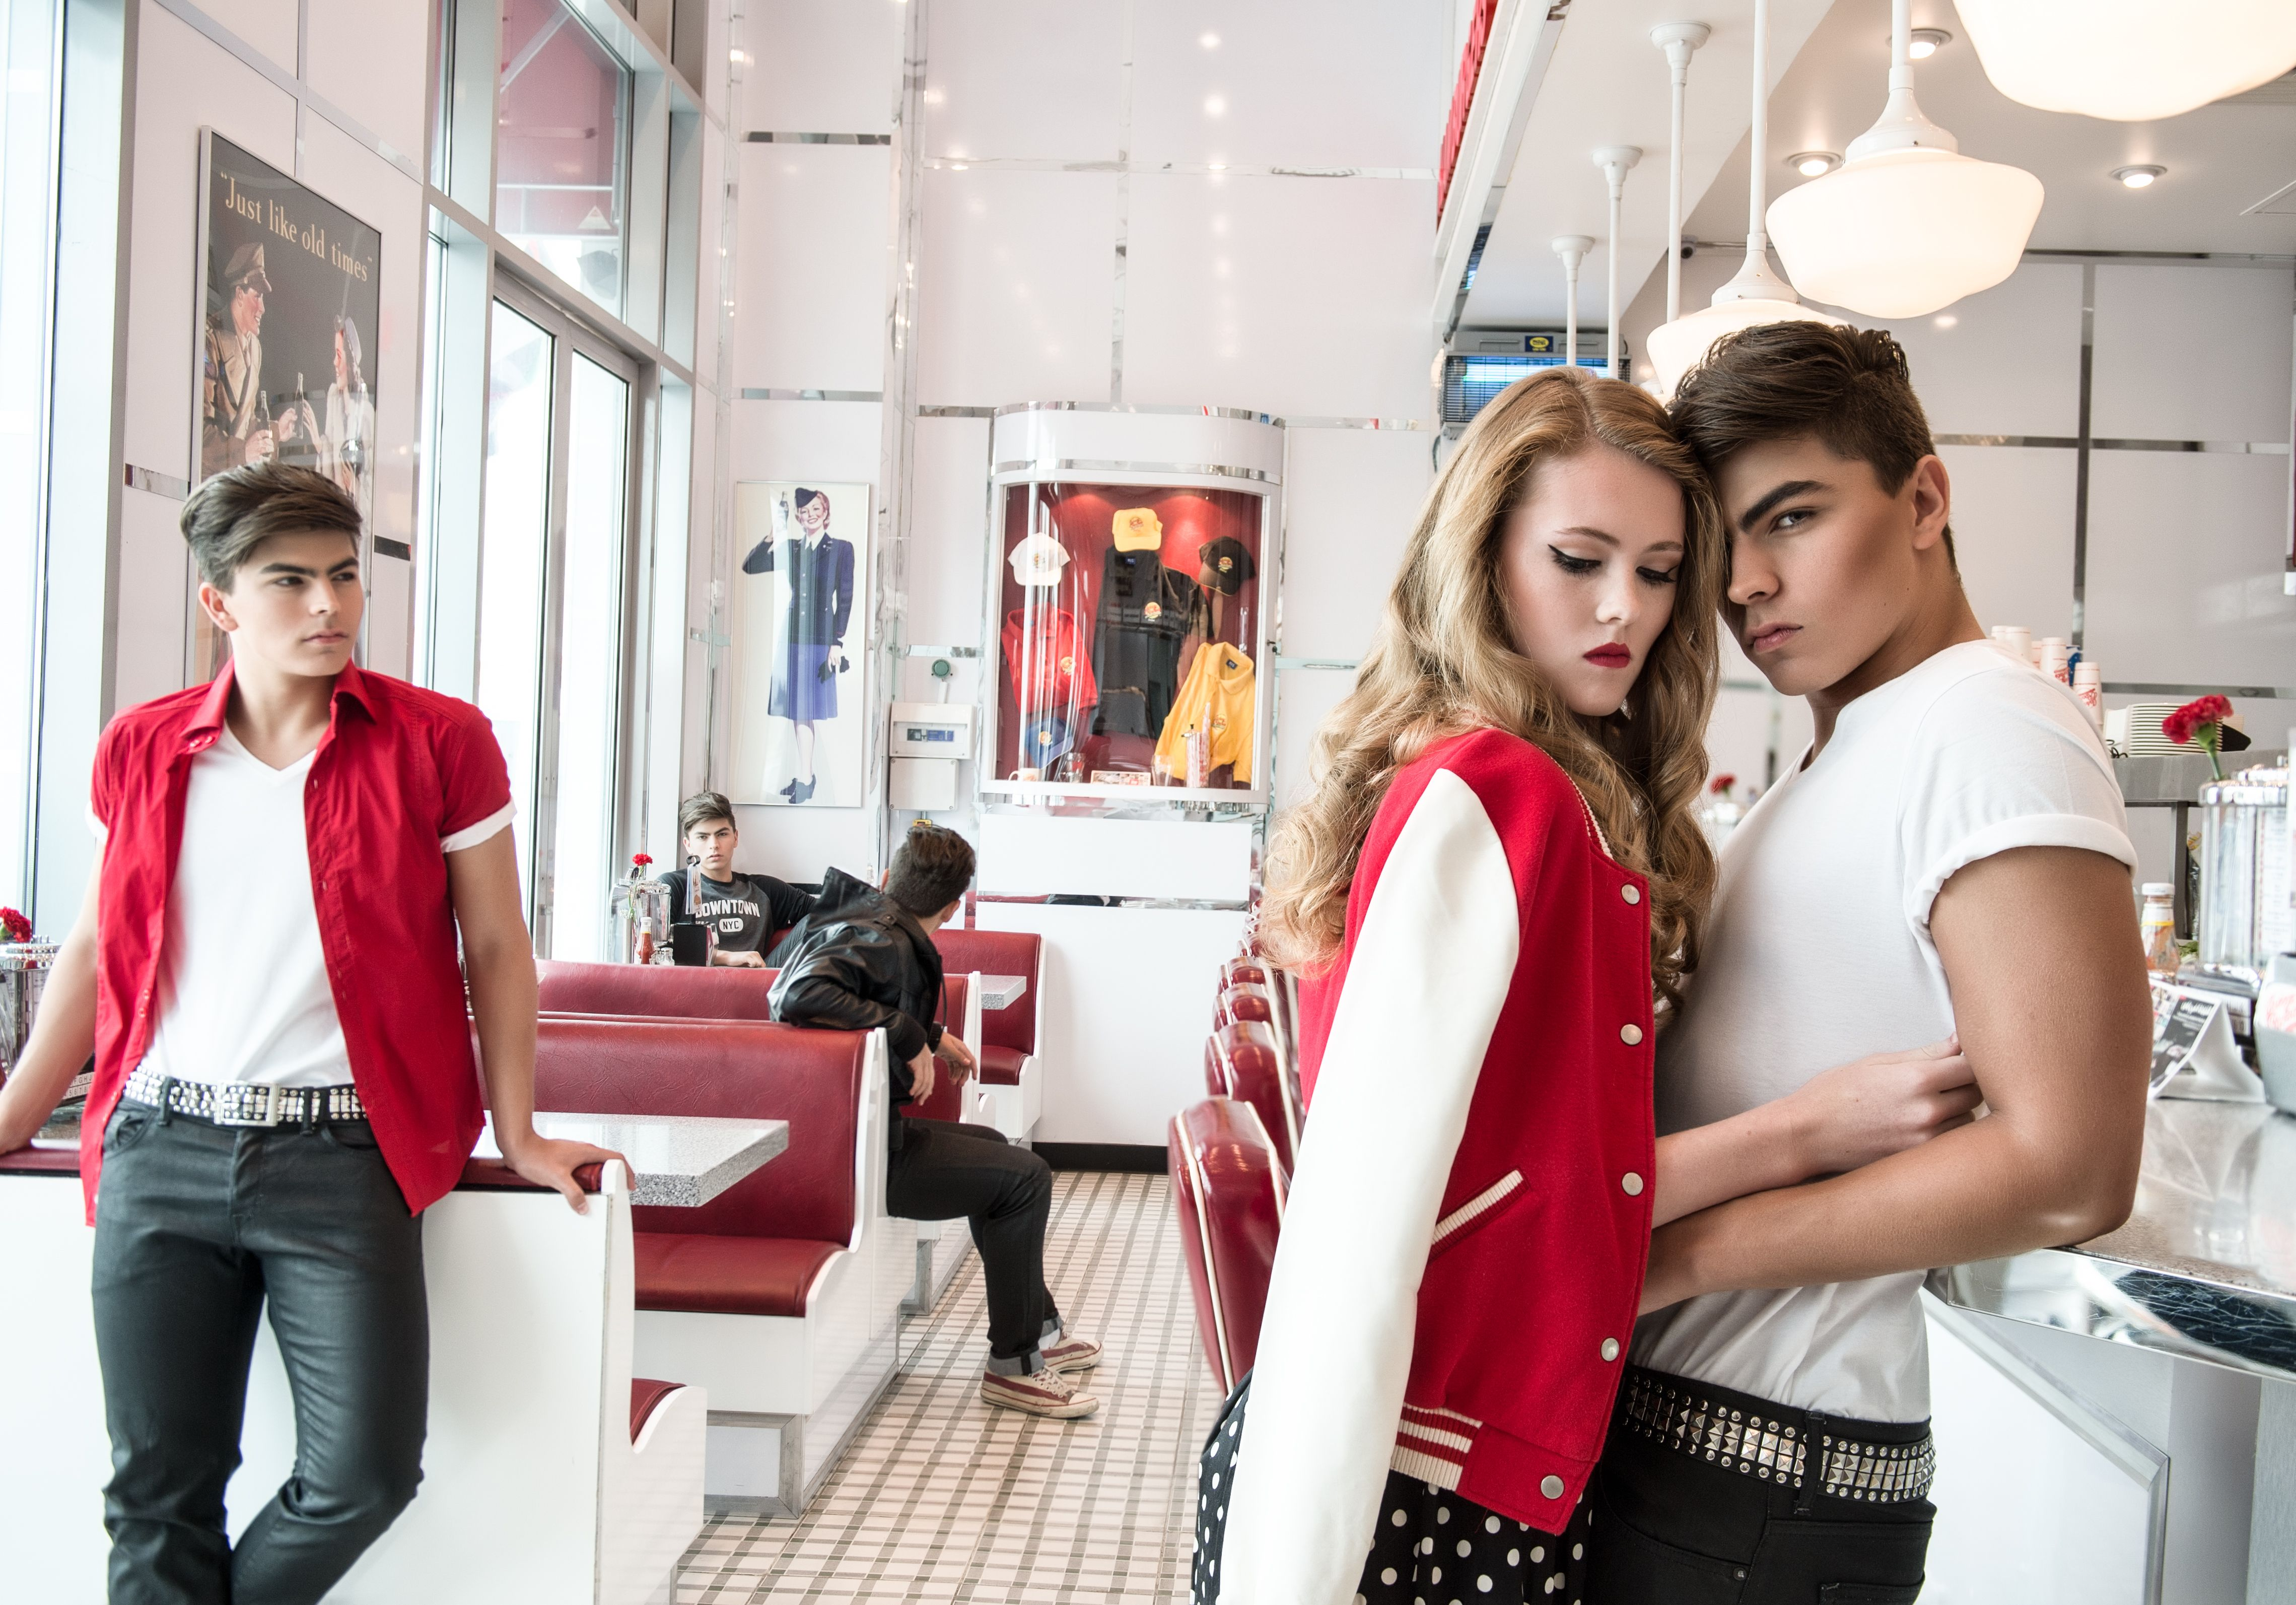 S Photo Shoot Red Teens Teen Love Dubai Dubai Models Letter Jacket Girl Boy Date Johnny Rockets Diner Cafe Red Chair Jacqueline Kent